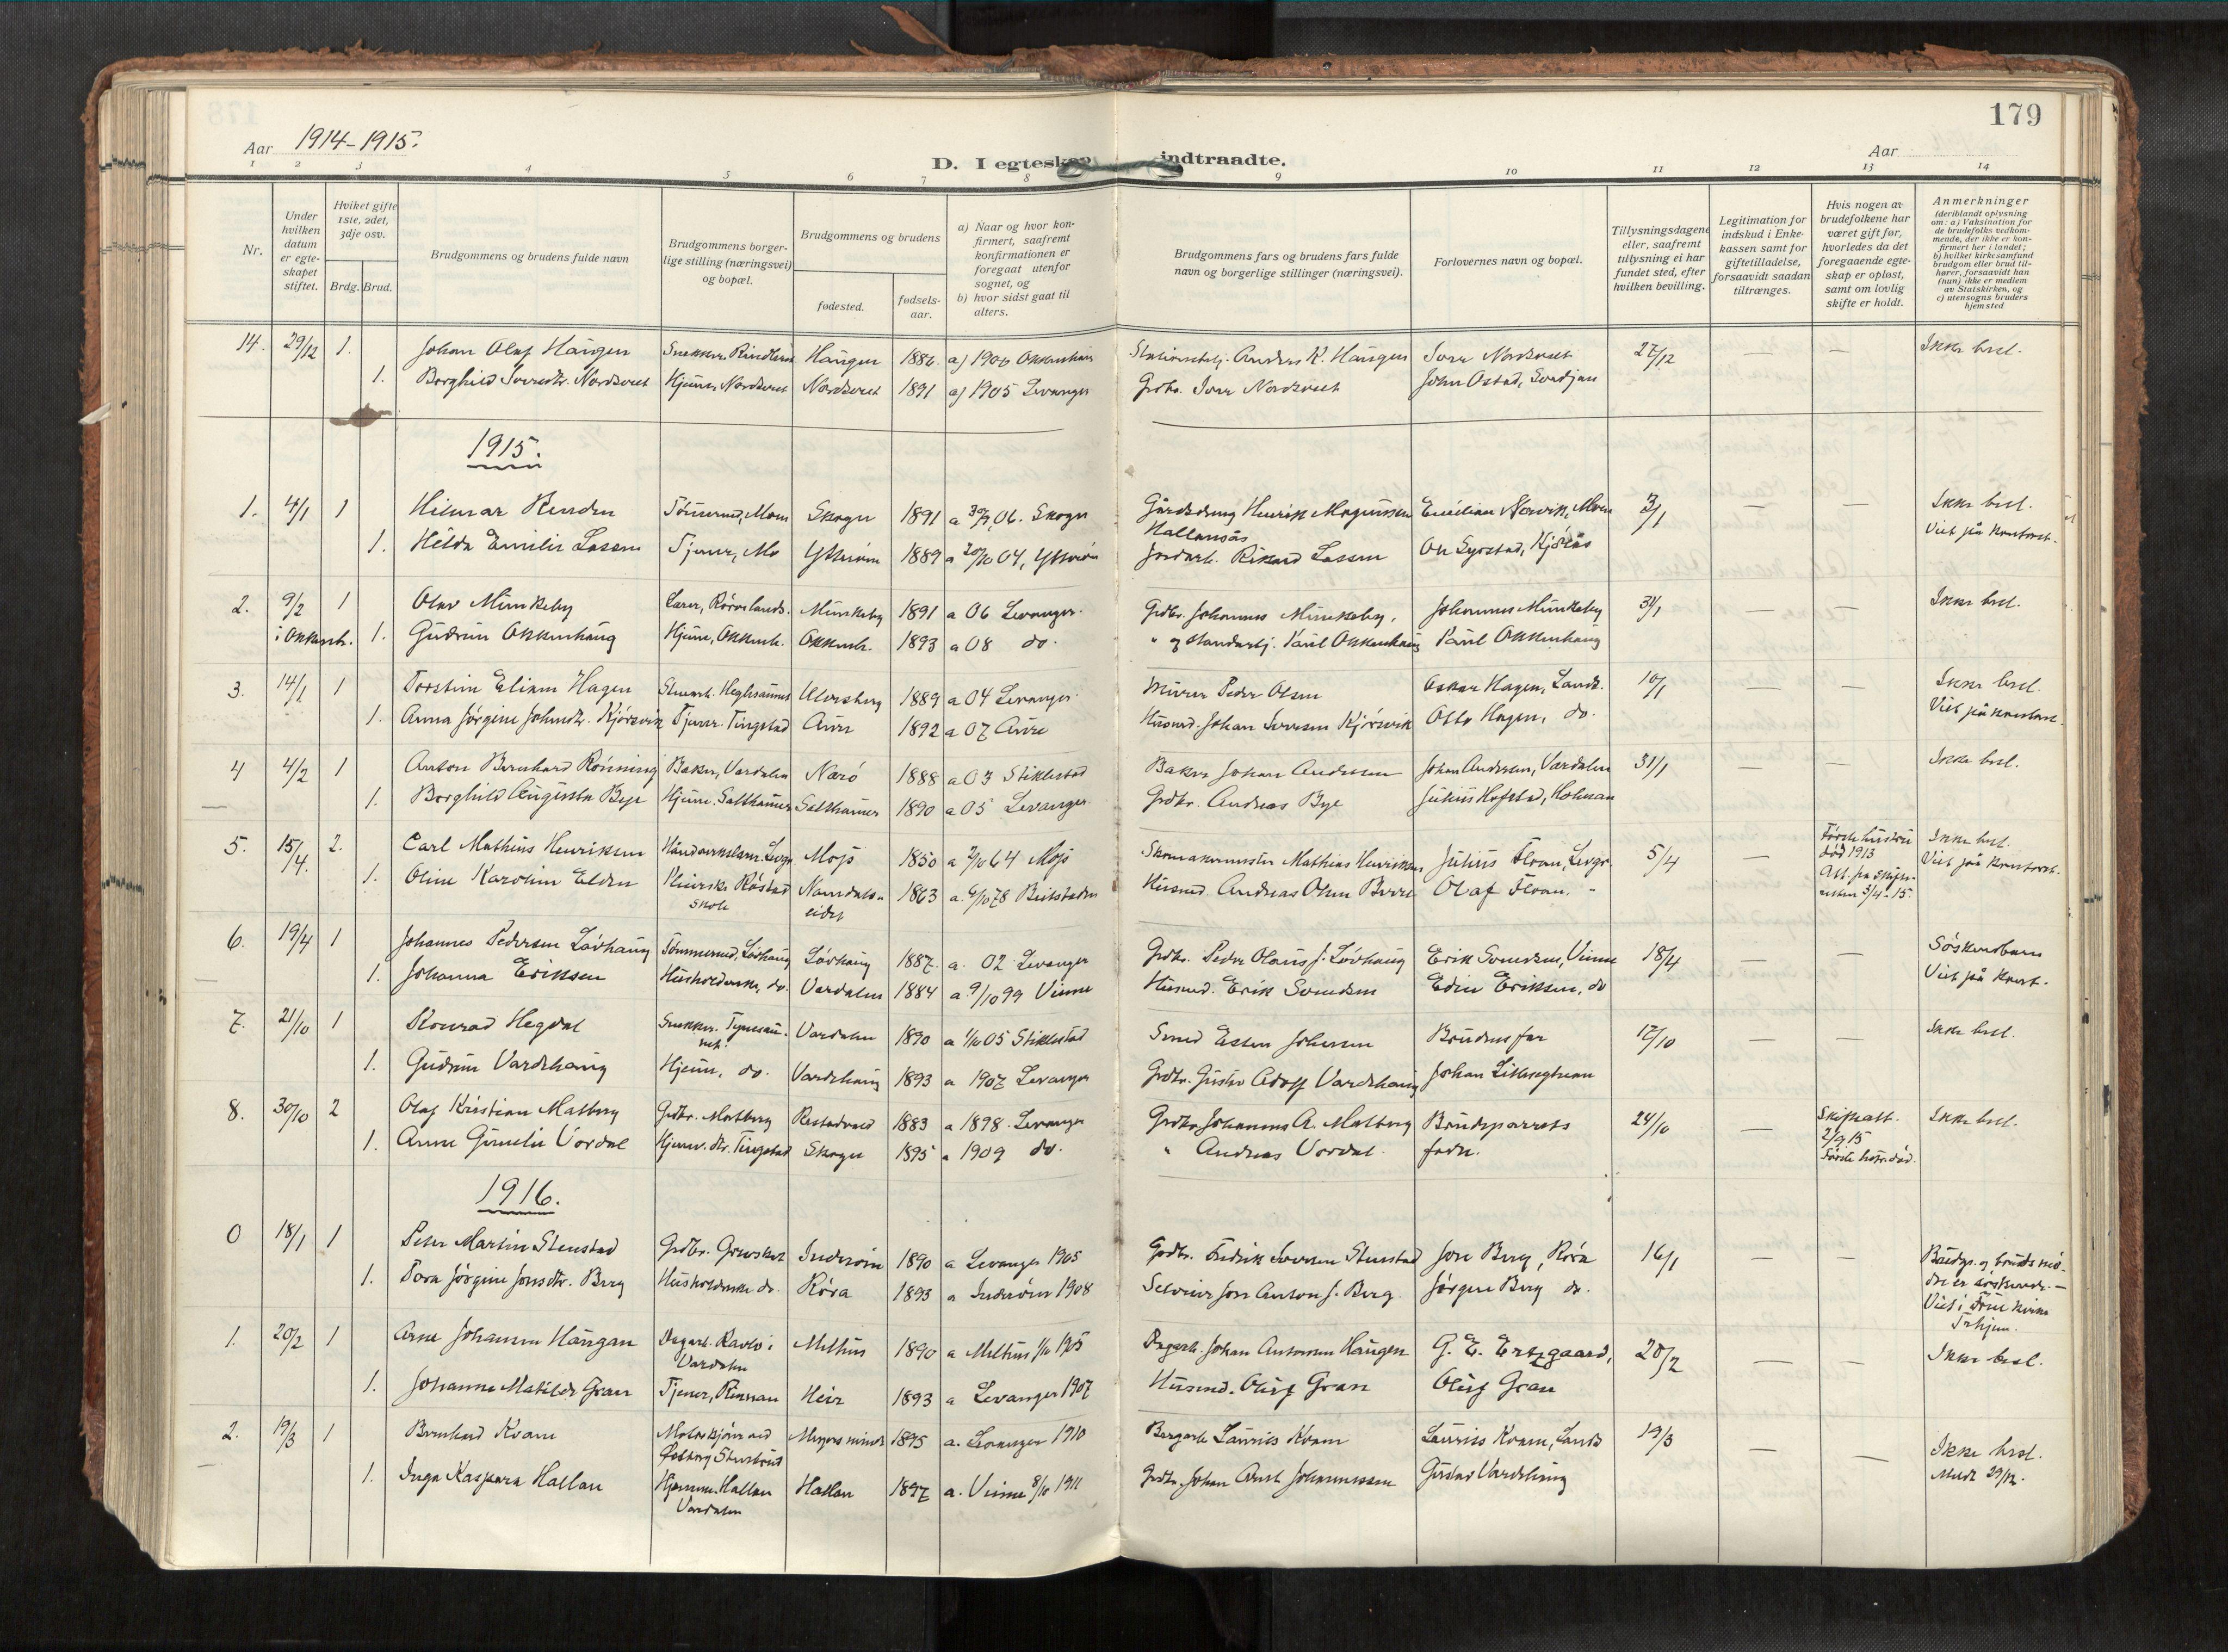 SAT, Levanger sokneprestkontor*, Parish register (official) no. 1, 1912-1935, p. 179